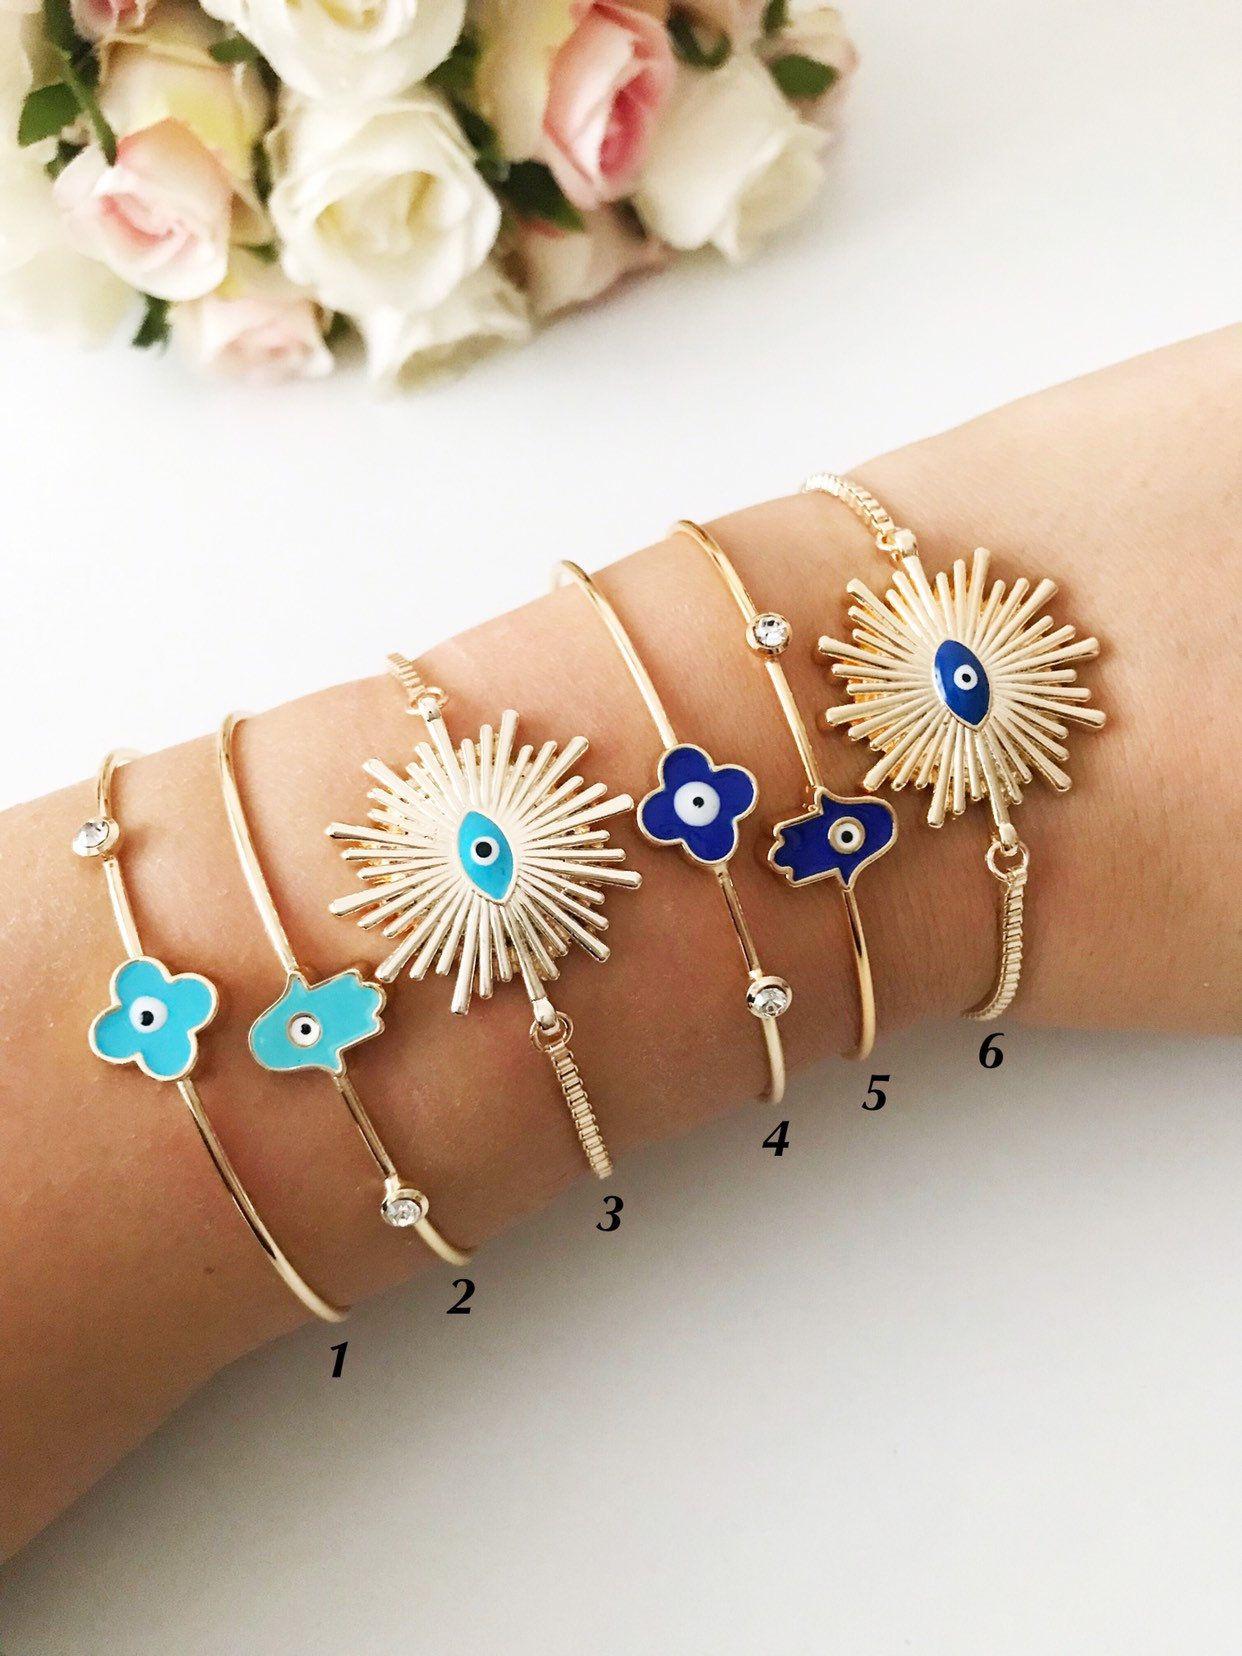 Evil eye bracelet, hamsa bracelet, bangle bracelet, evil eye jewelry, sunny evil eye charm bracelet, adjustable bracelet, clover bracelet